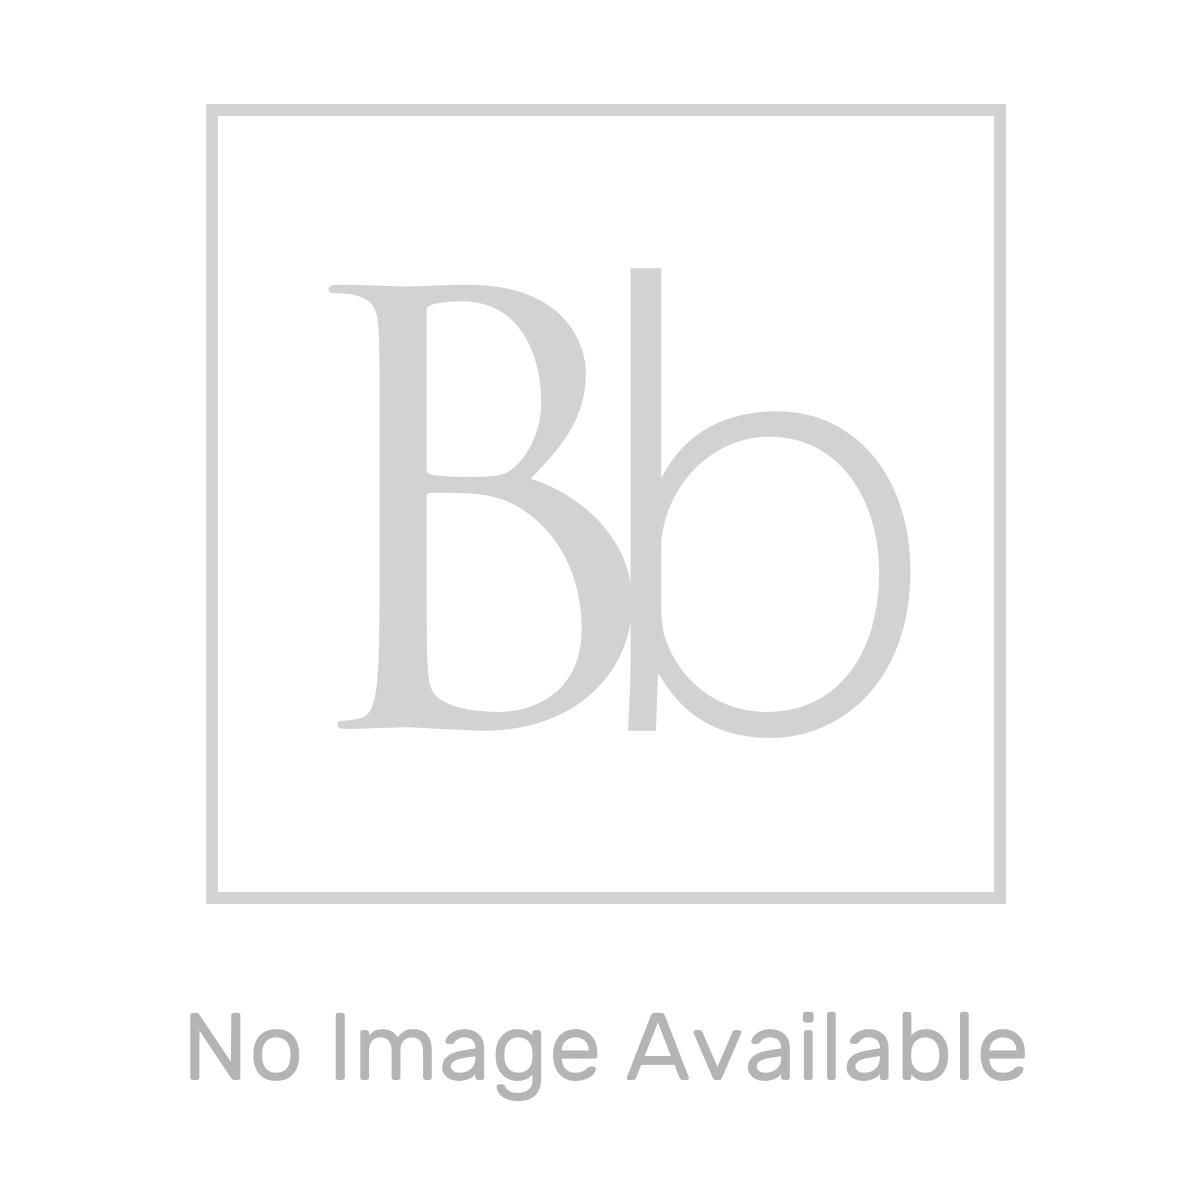 Elation Combination L Shape Bodega Grey Furniture Pack 1070mm Dimensions